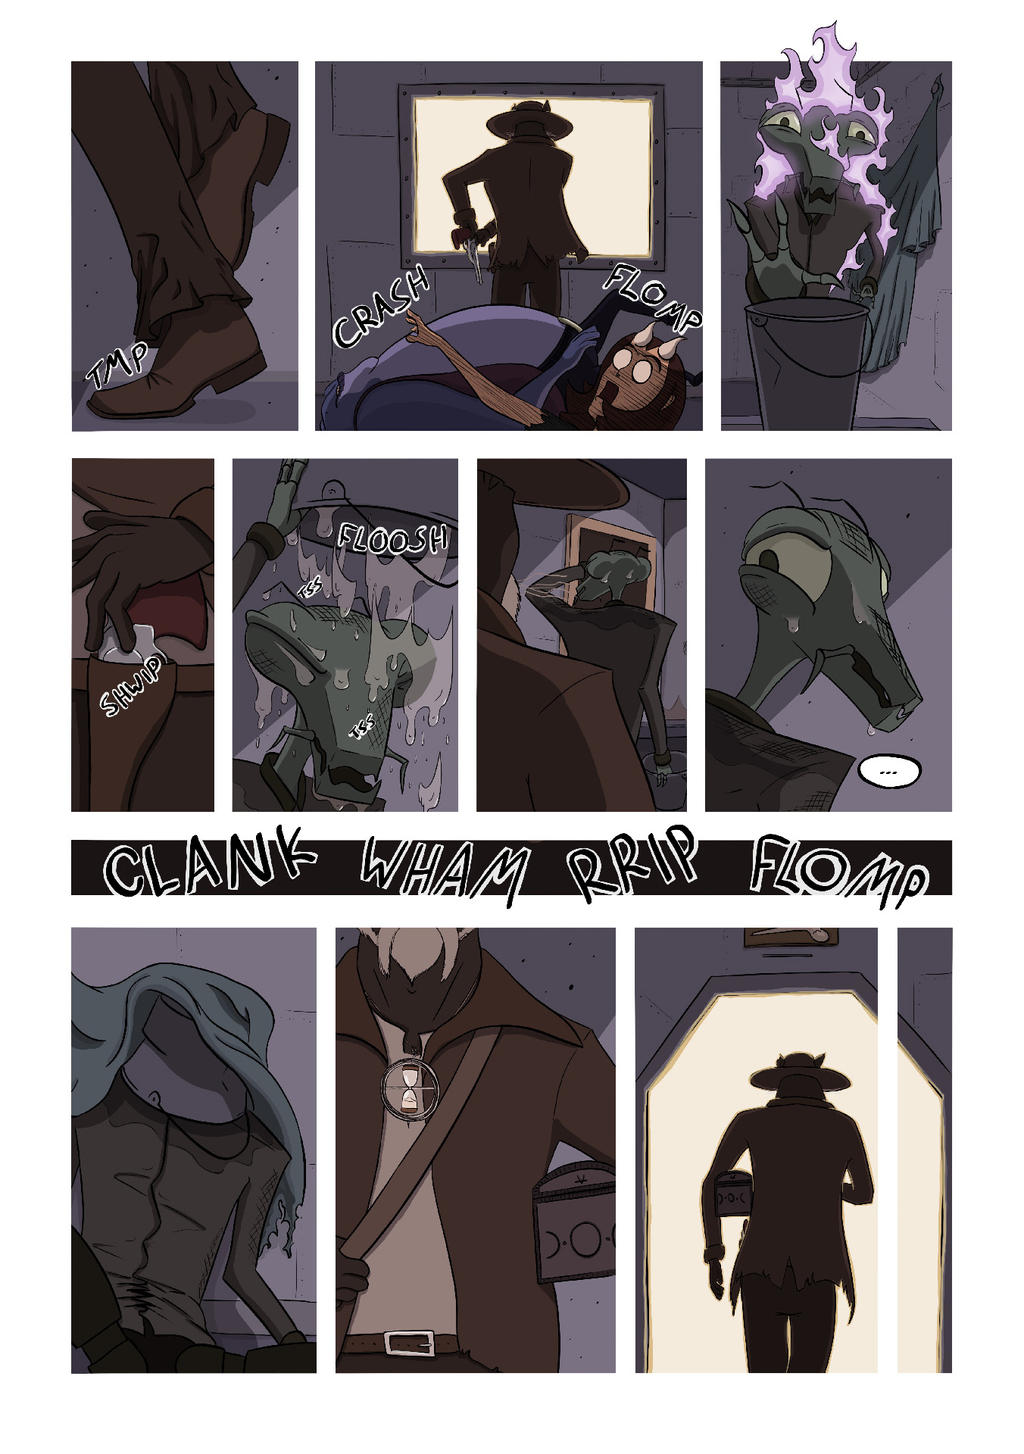 Stranger Page 5 by Zoph42